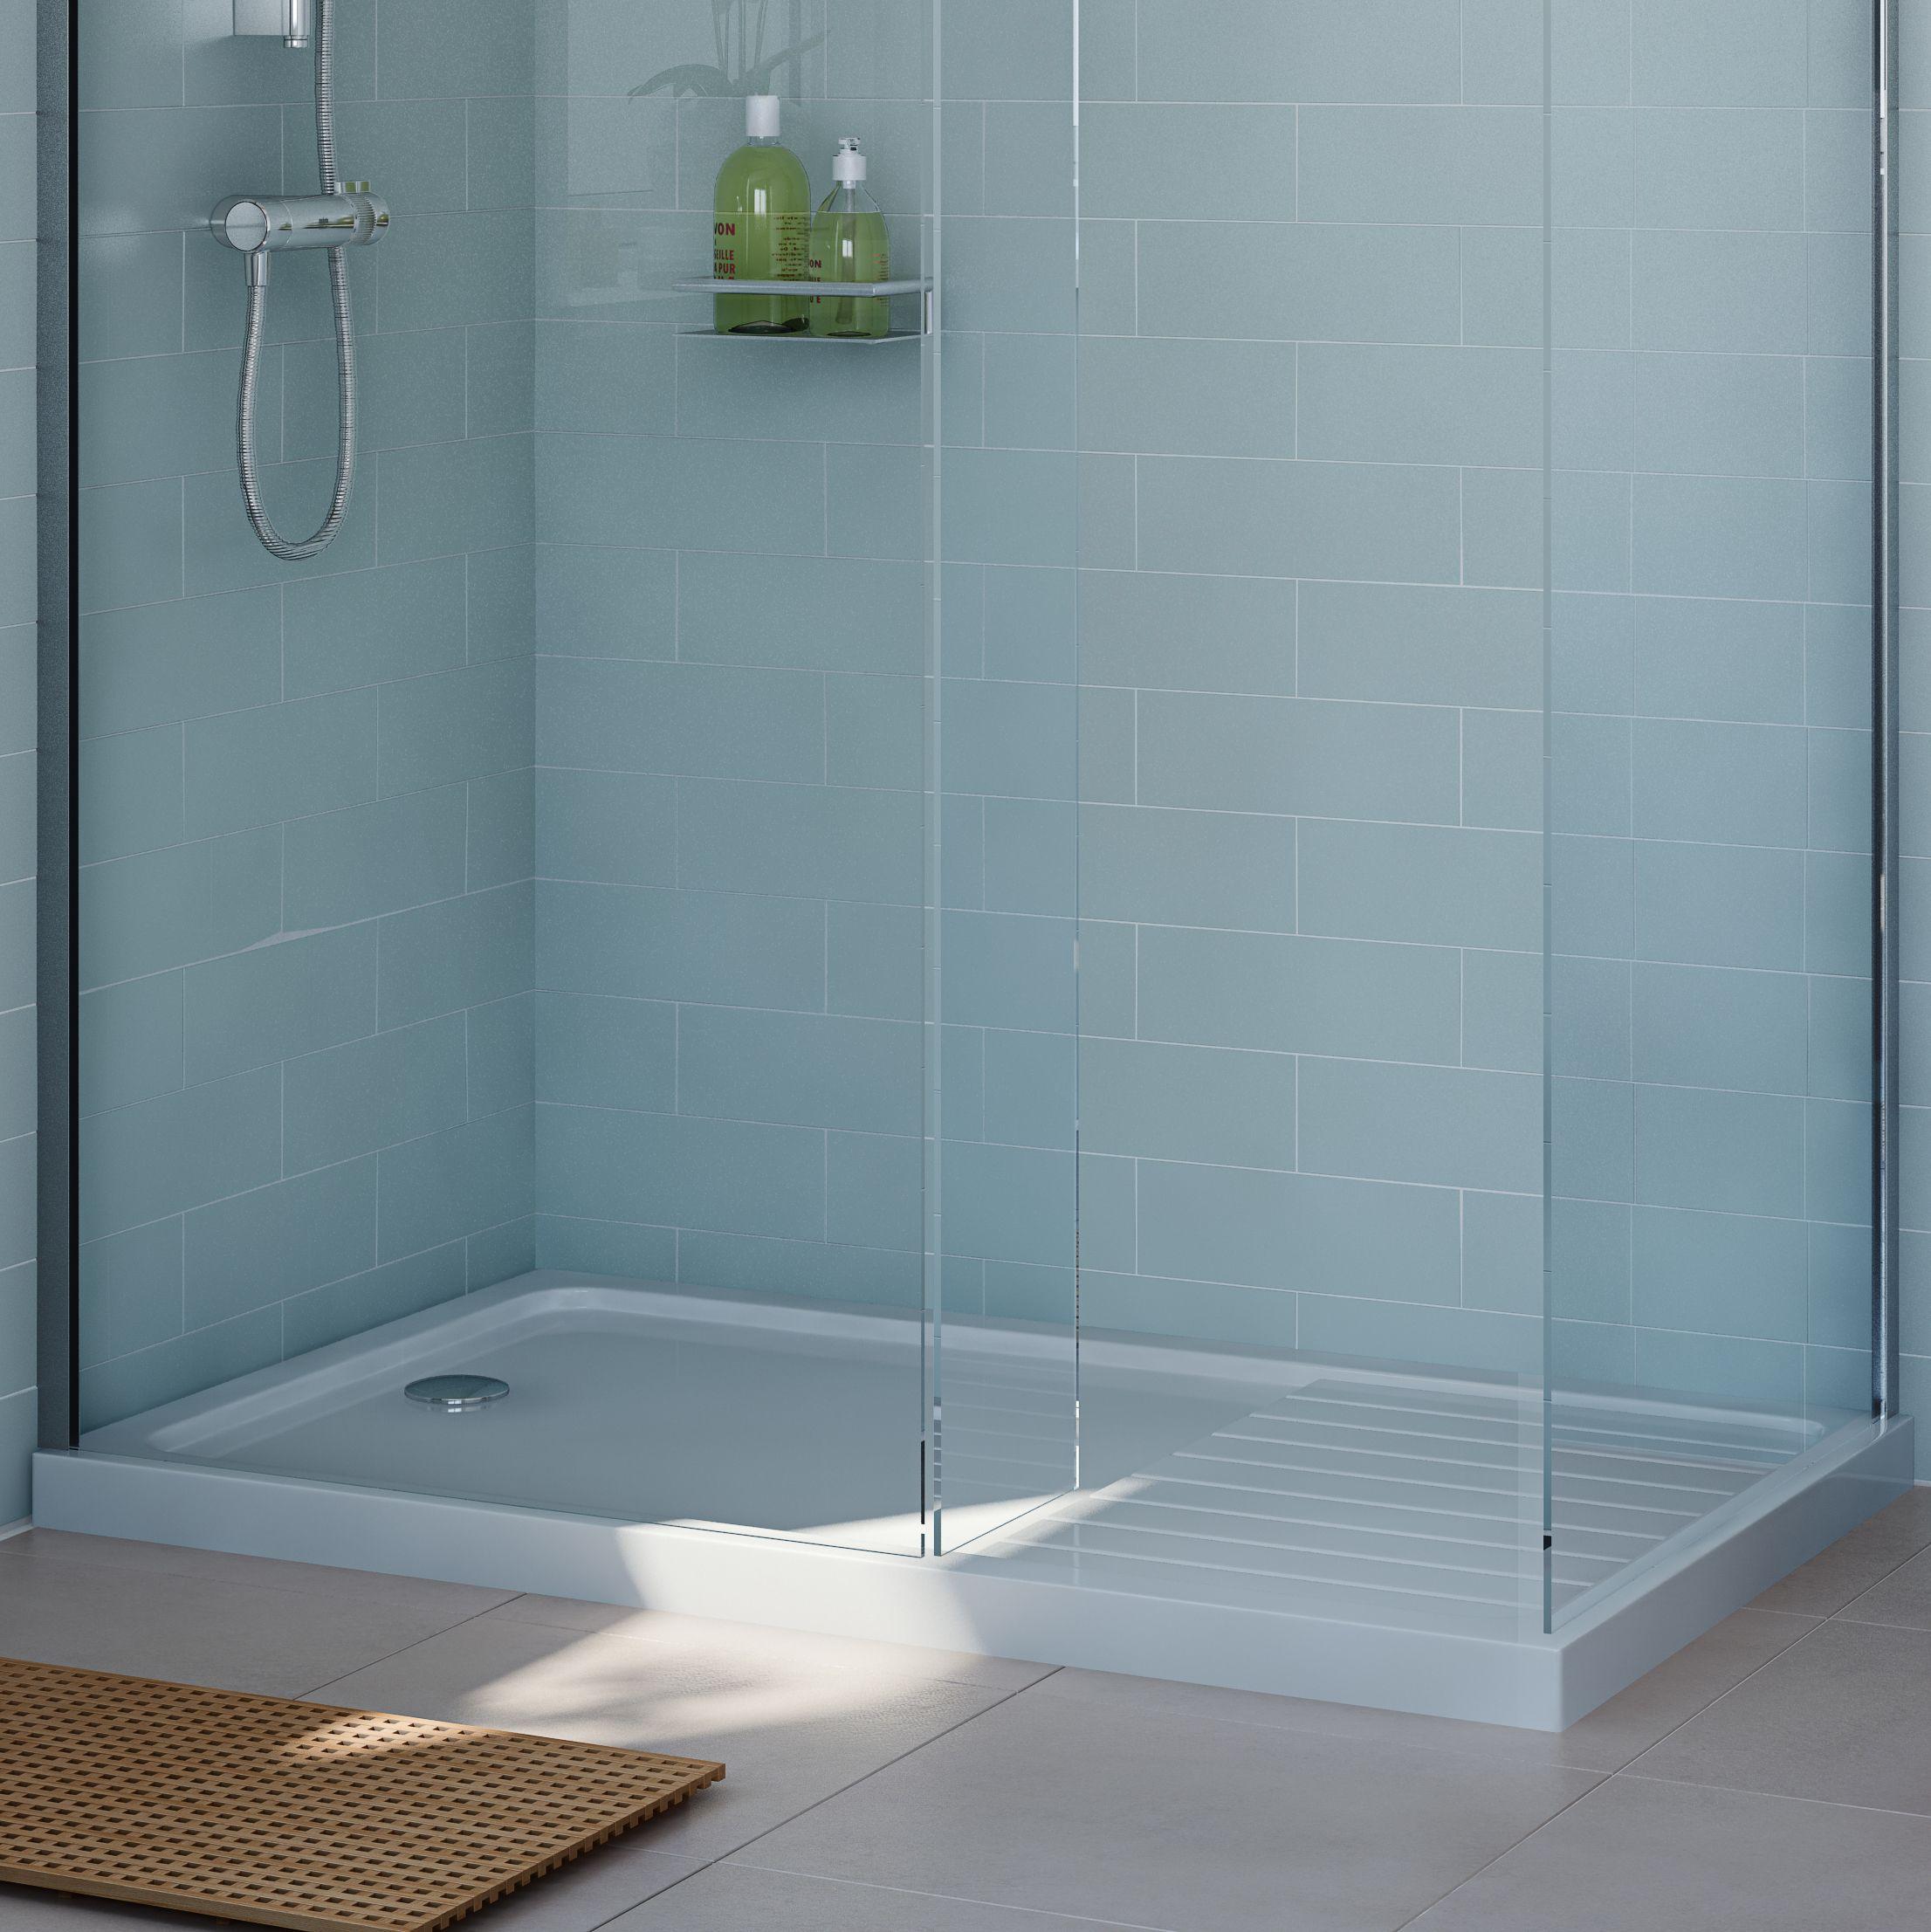 Cooke & Lewis Rectangular Shower tray (L)1300mm (W)800mm (D)40mm ...